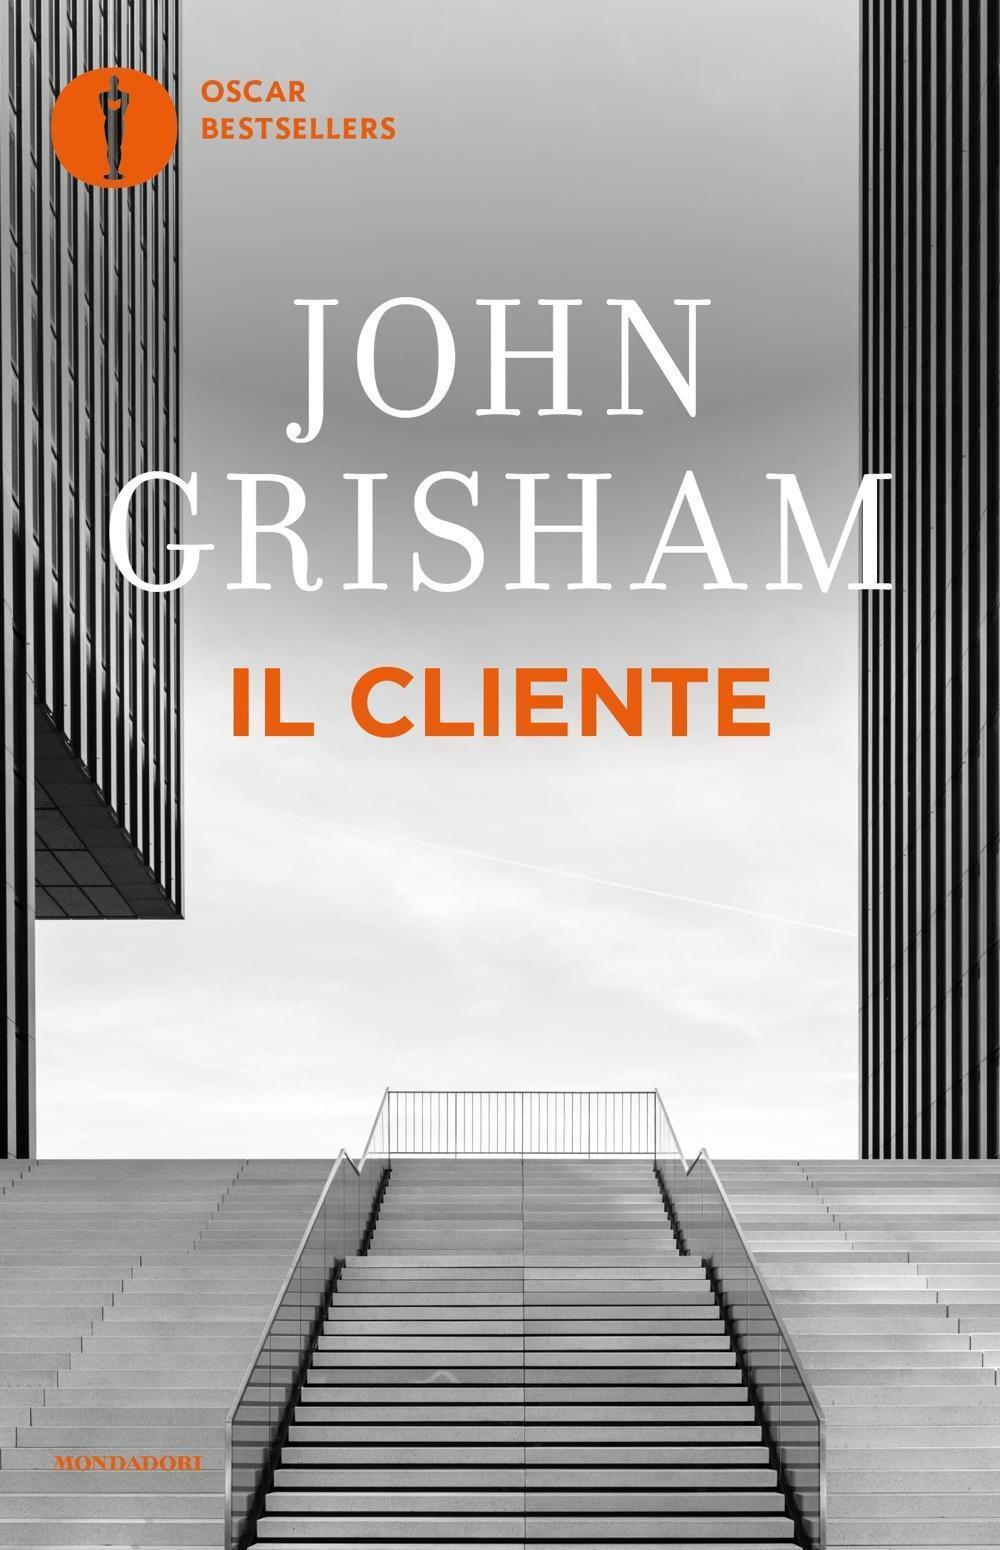 Il cliente john grisham libro mondadori oscar bestsellers ibs